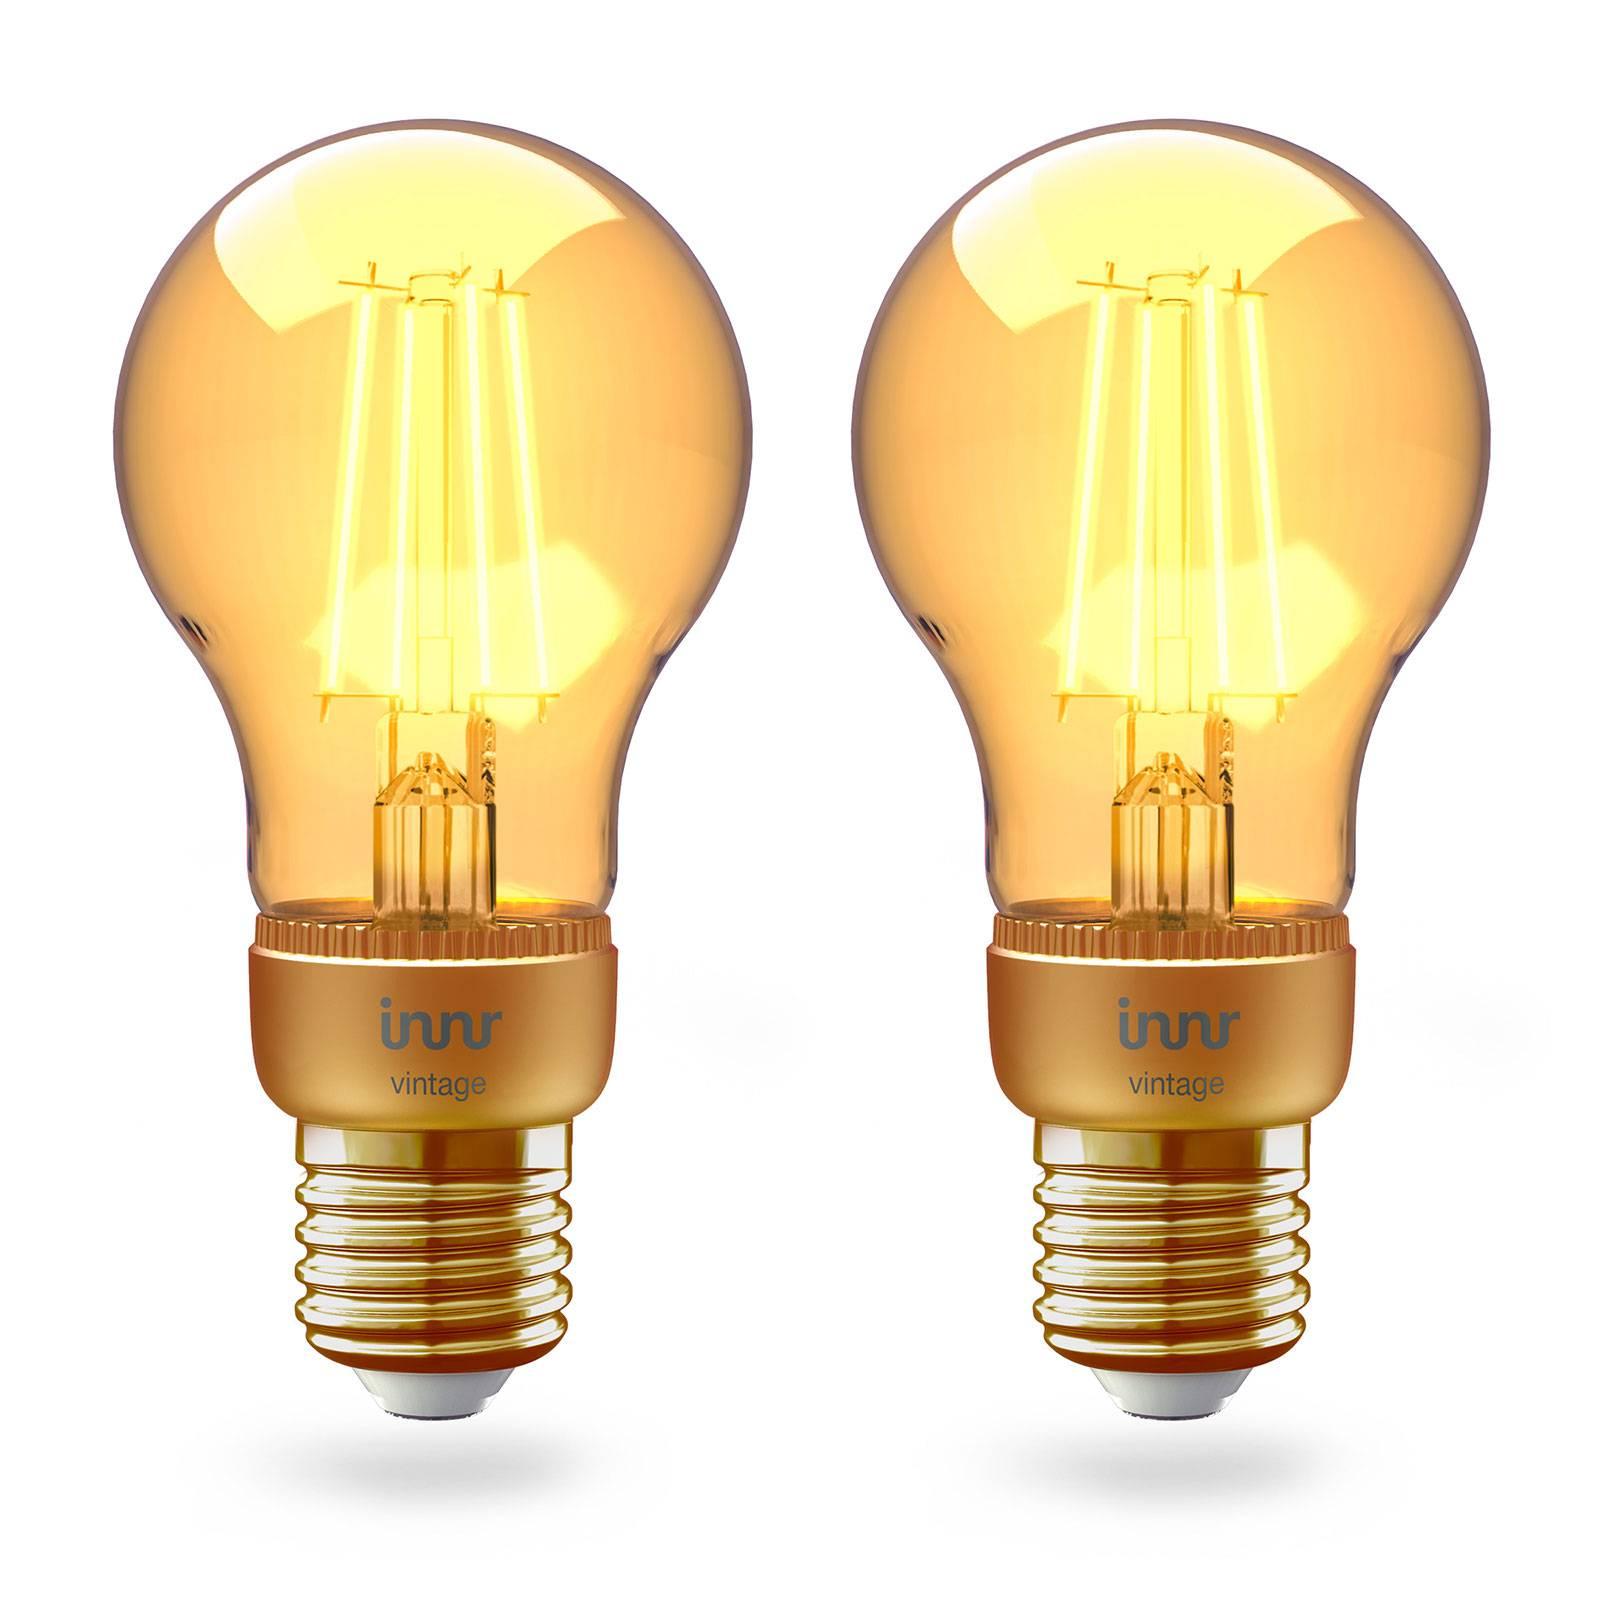 Innr LED E27 4,2W Smart Filament kulta, 2 kpl